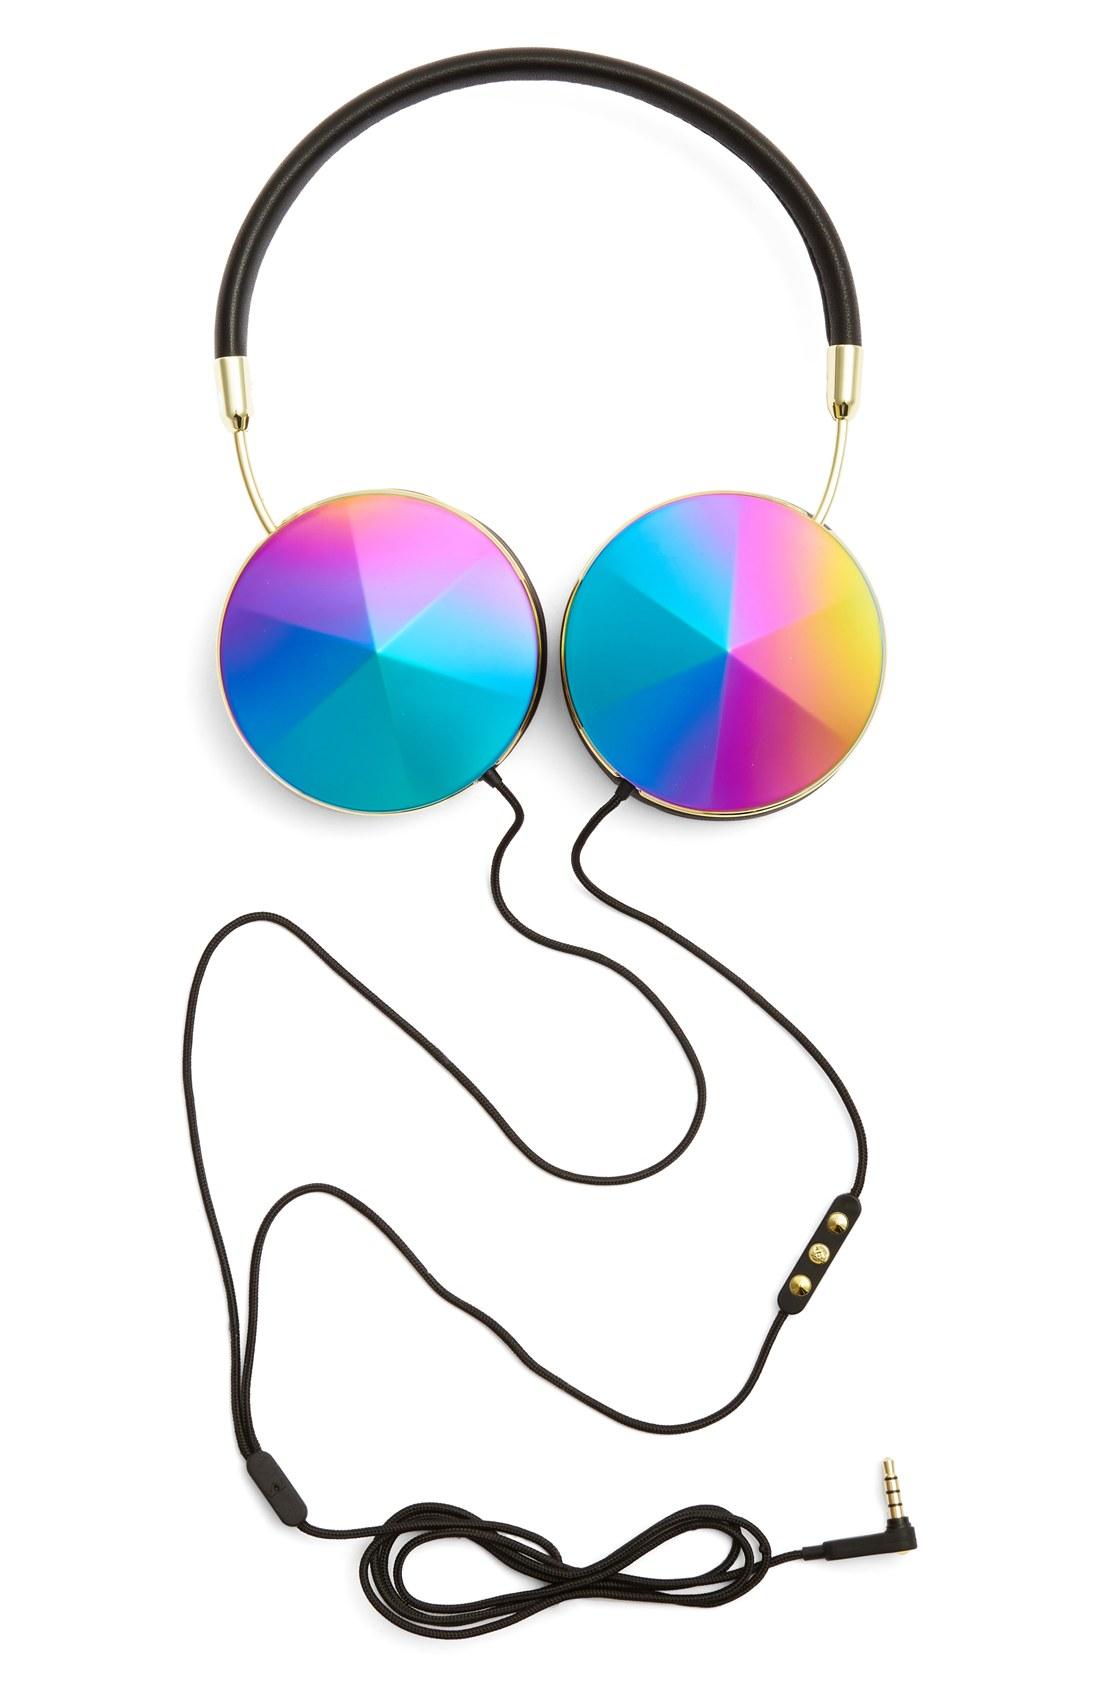 creative Headphone design and concept 14